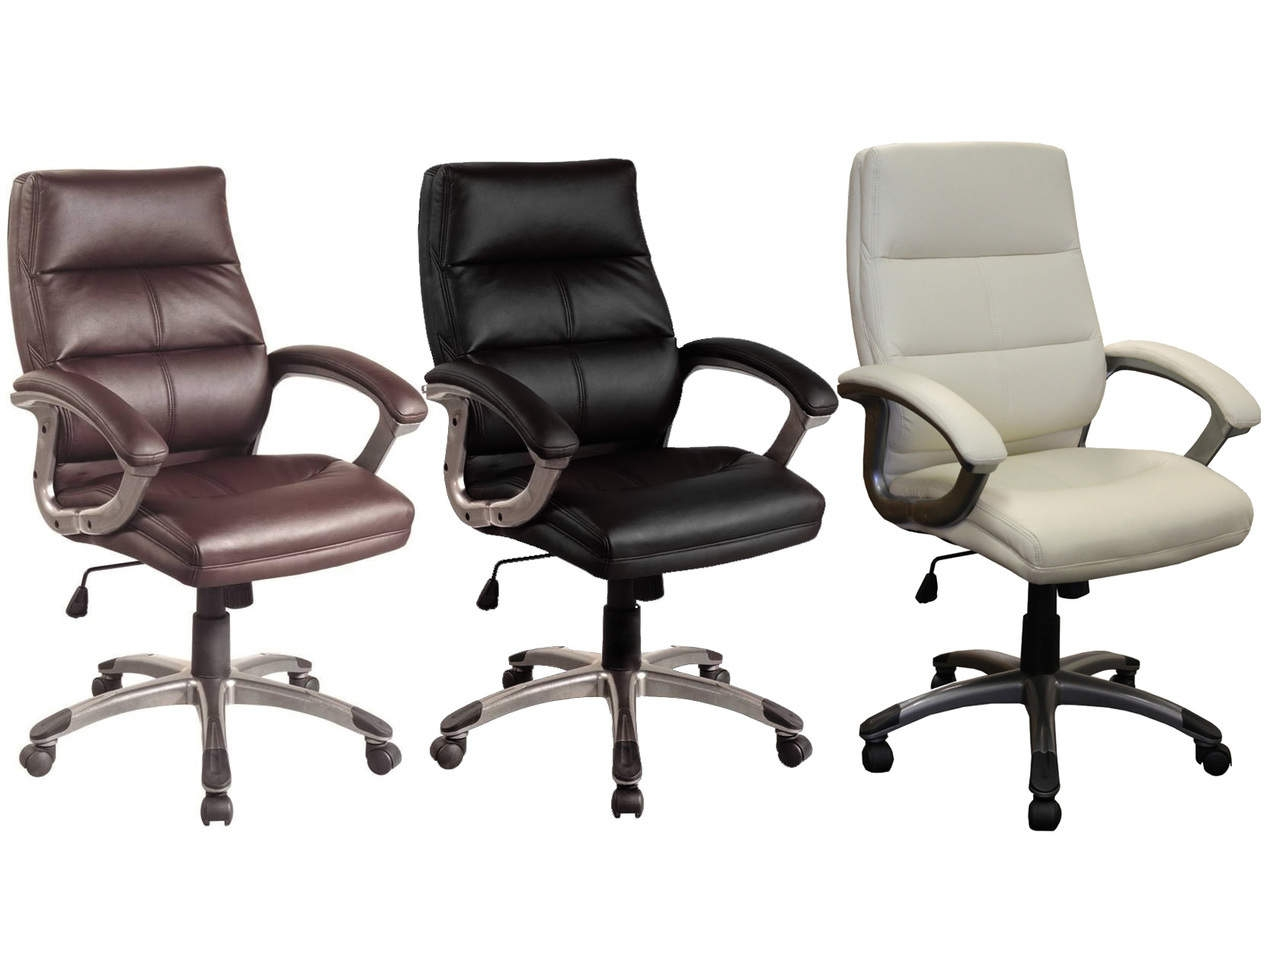 Greenwich Medium Back PU Leather Executive Chair in Black, Brown or Cream